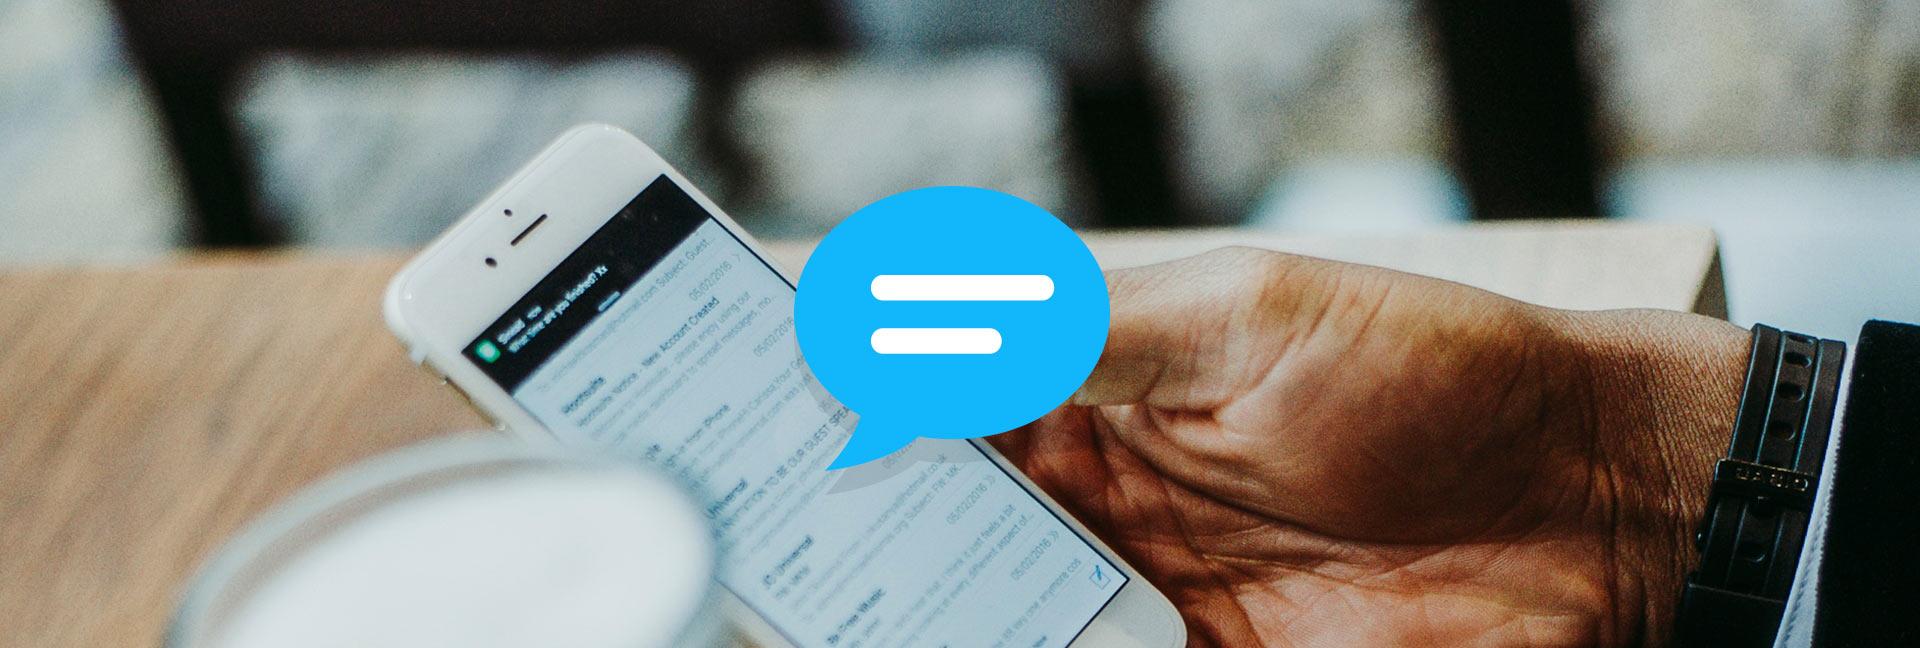 Blue cartoon speech buble coming from a phone